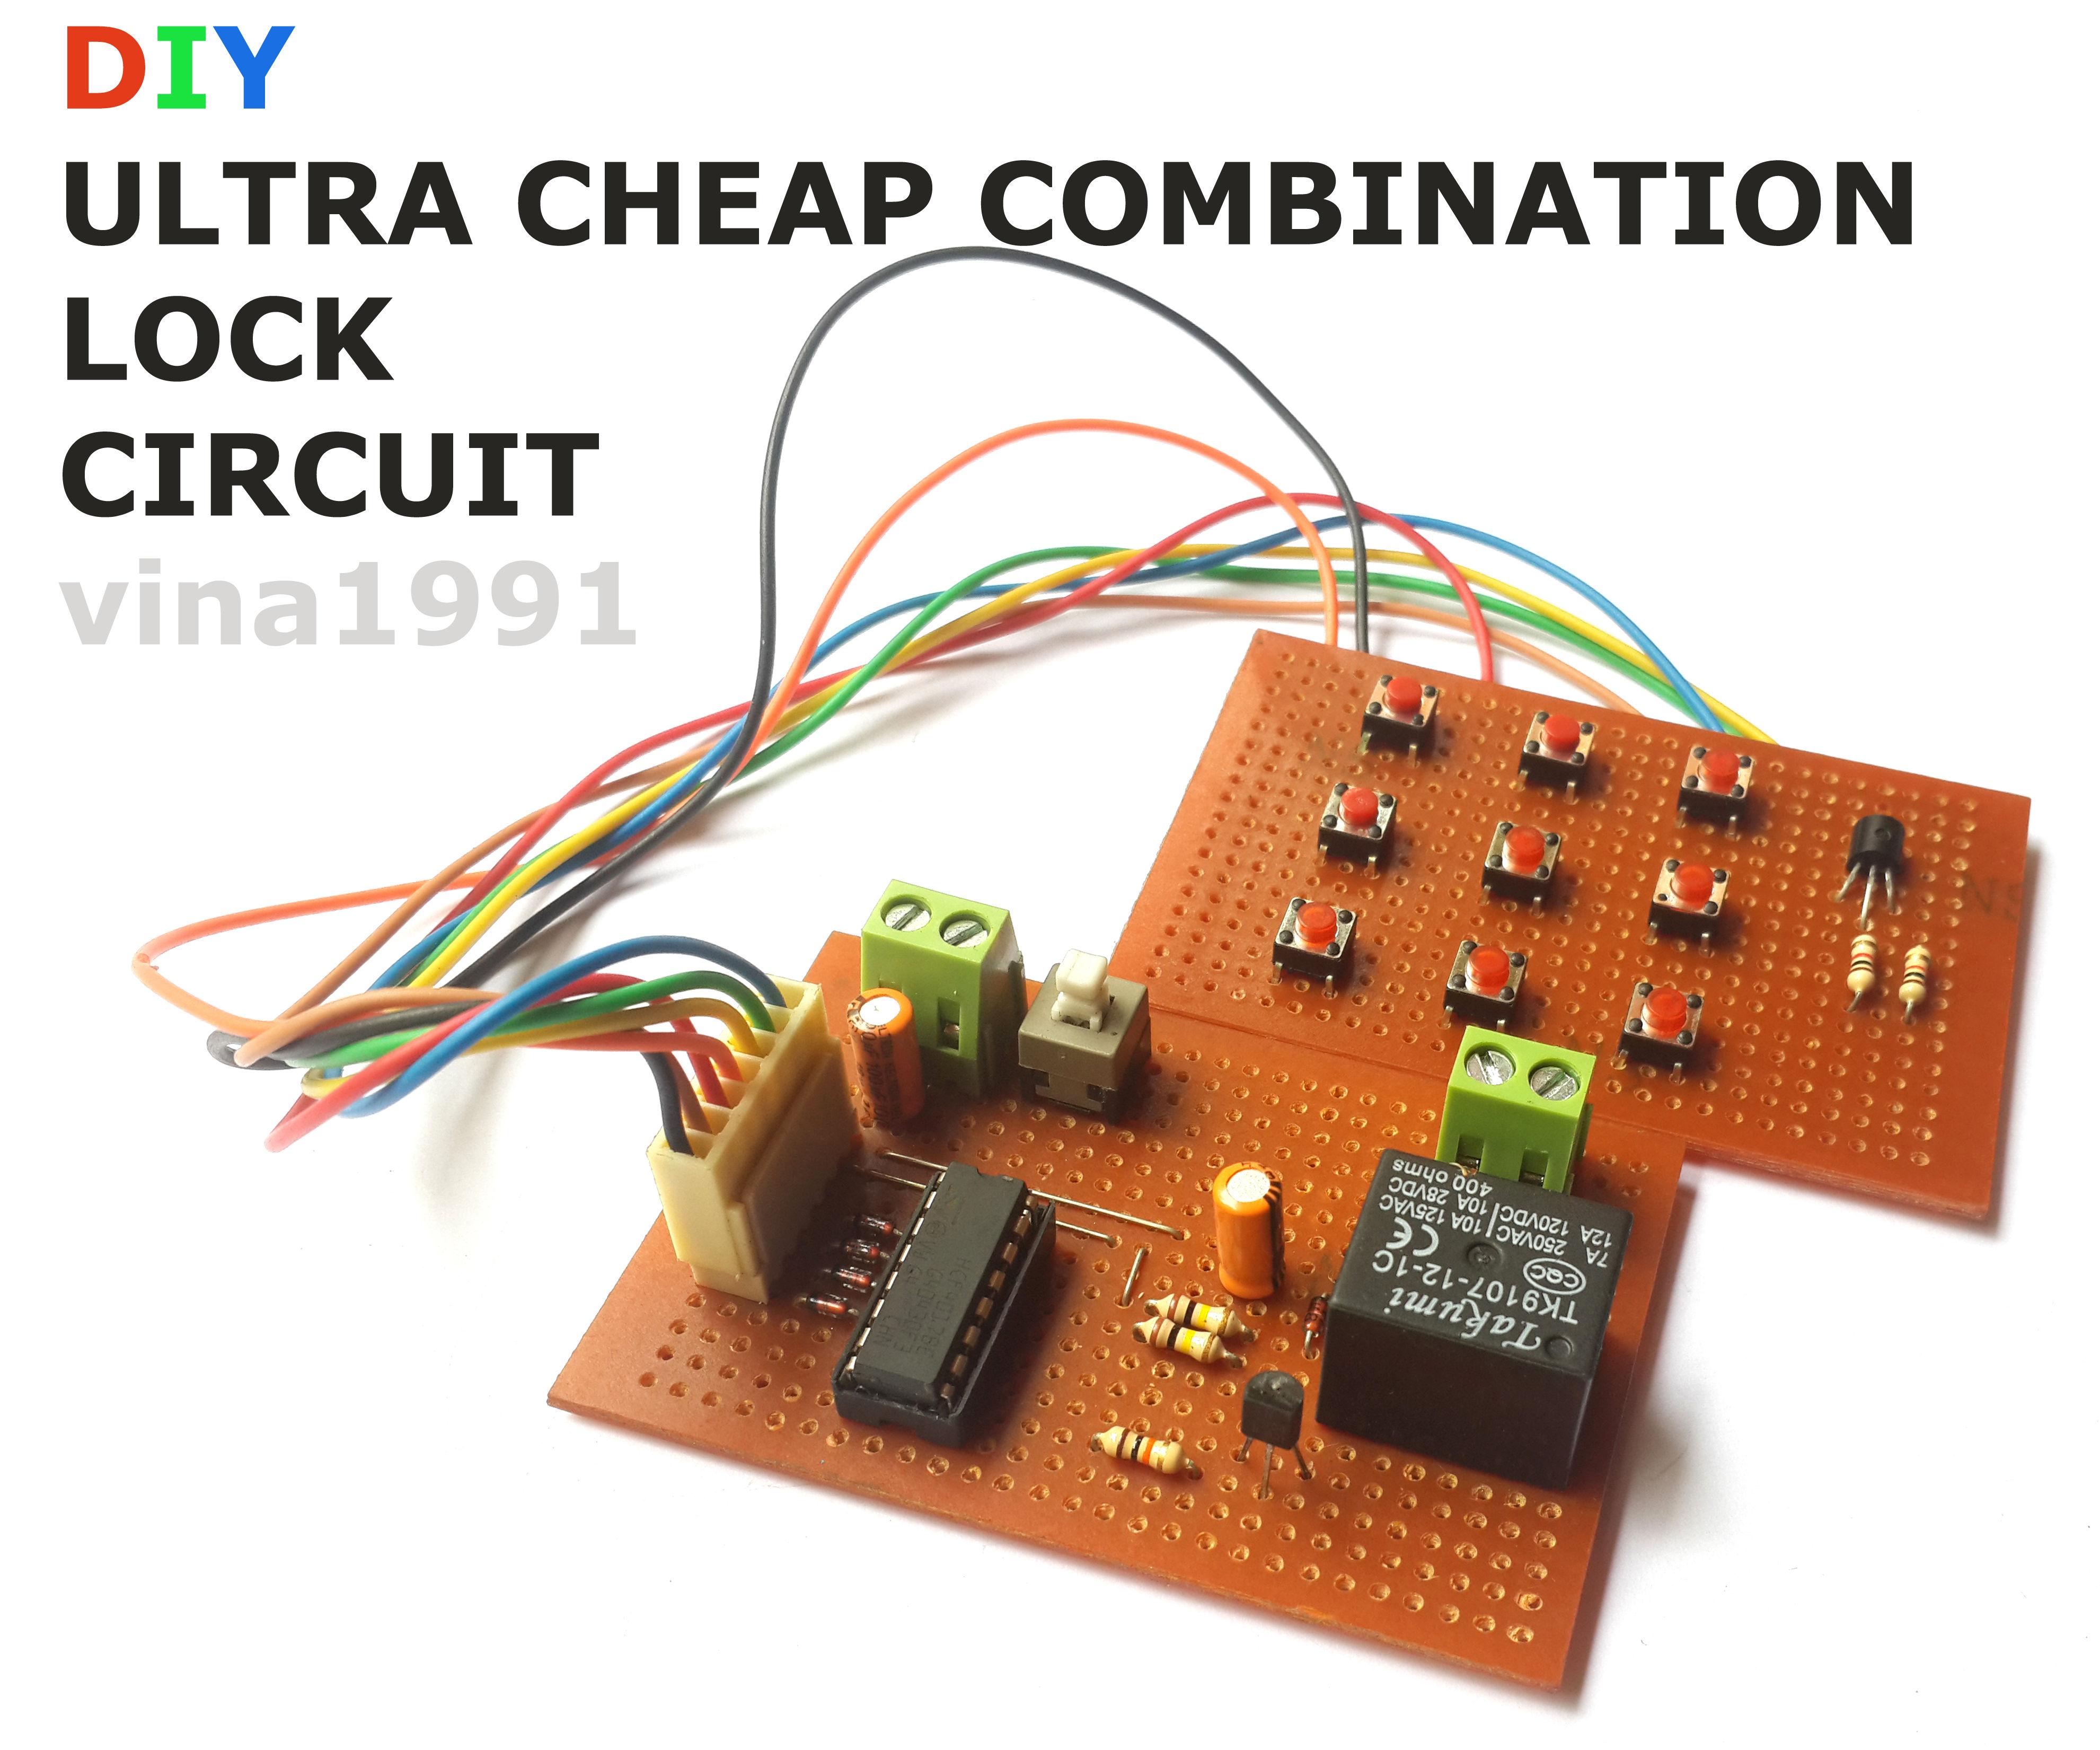 DIY ULTRA CHEAP COMBINATION LOCK